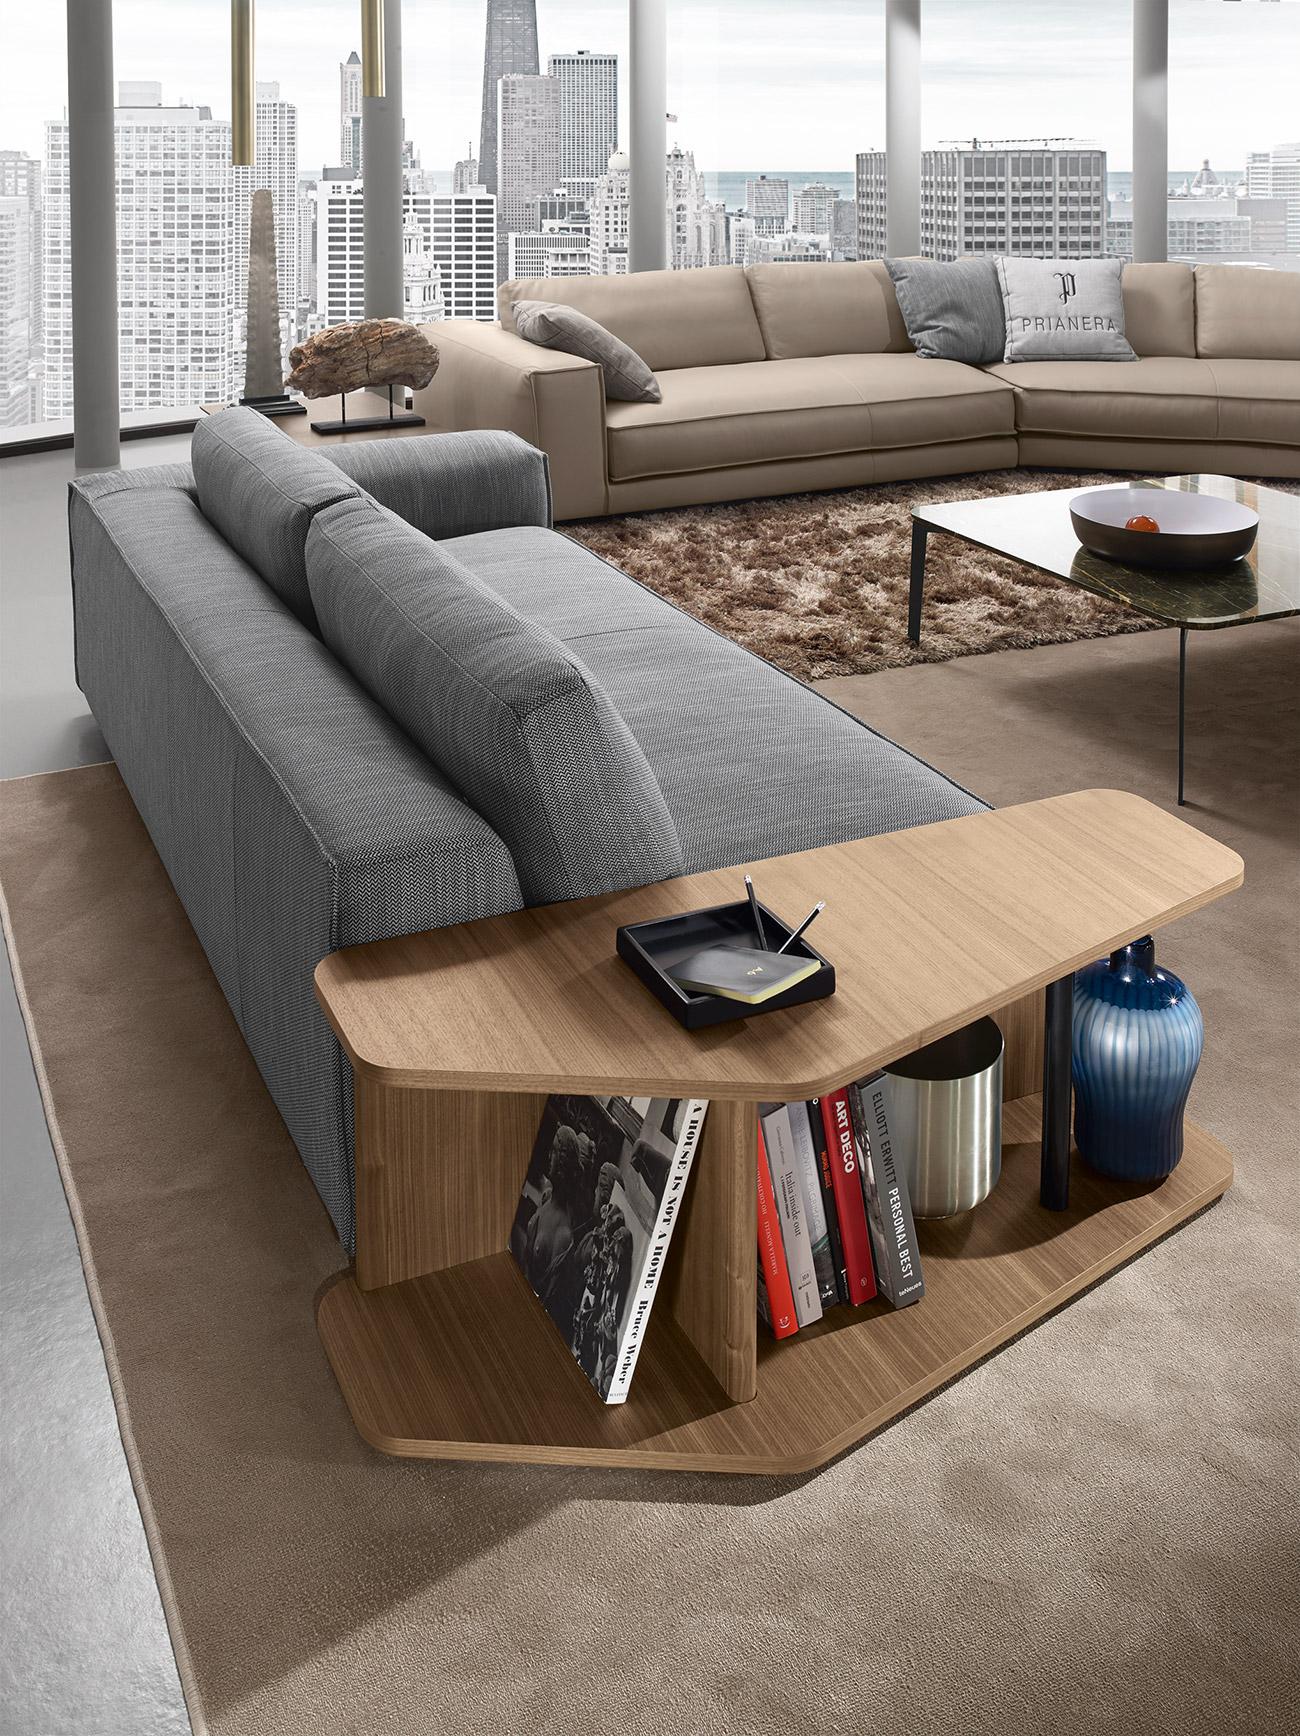 wooden side table for books, sofa side table real wood, xilino trapezaki dipla apo kanape,